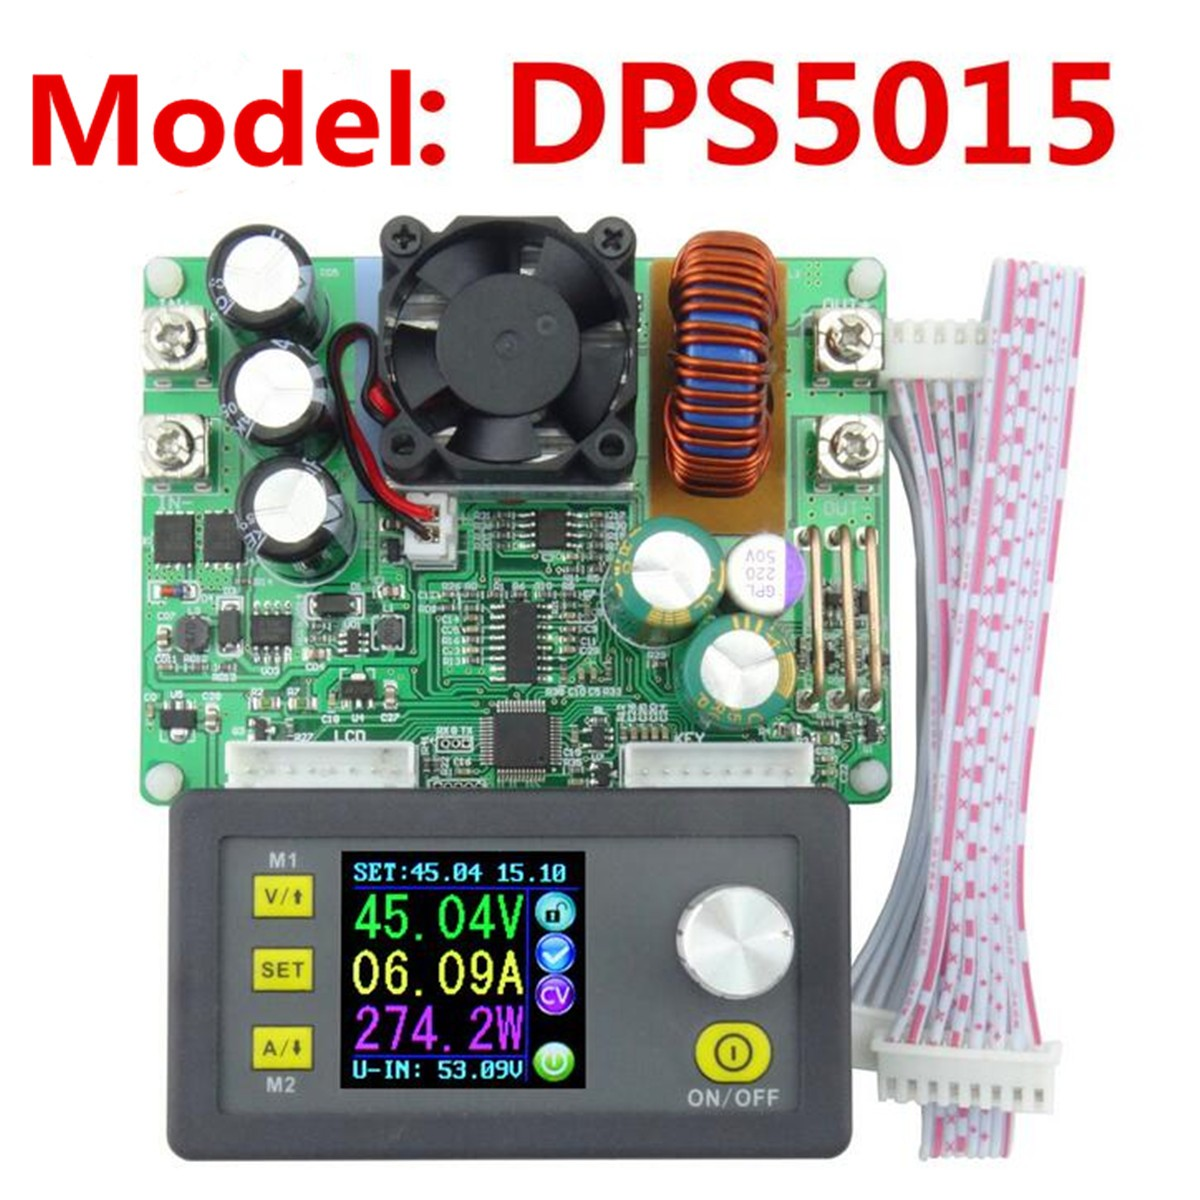 DP30V5A DPS3012 DPS5015 LCD Voltmeter Current Voltage Tester Step-down Programmable Power Supply Module Regulator Converter